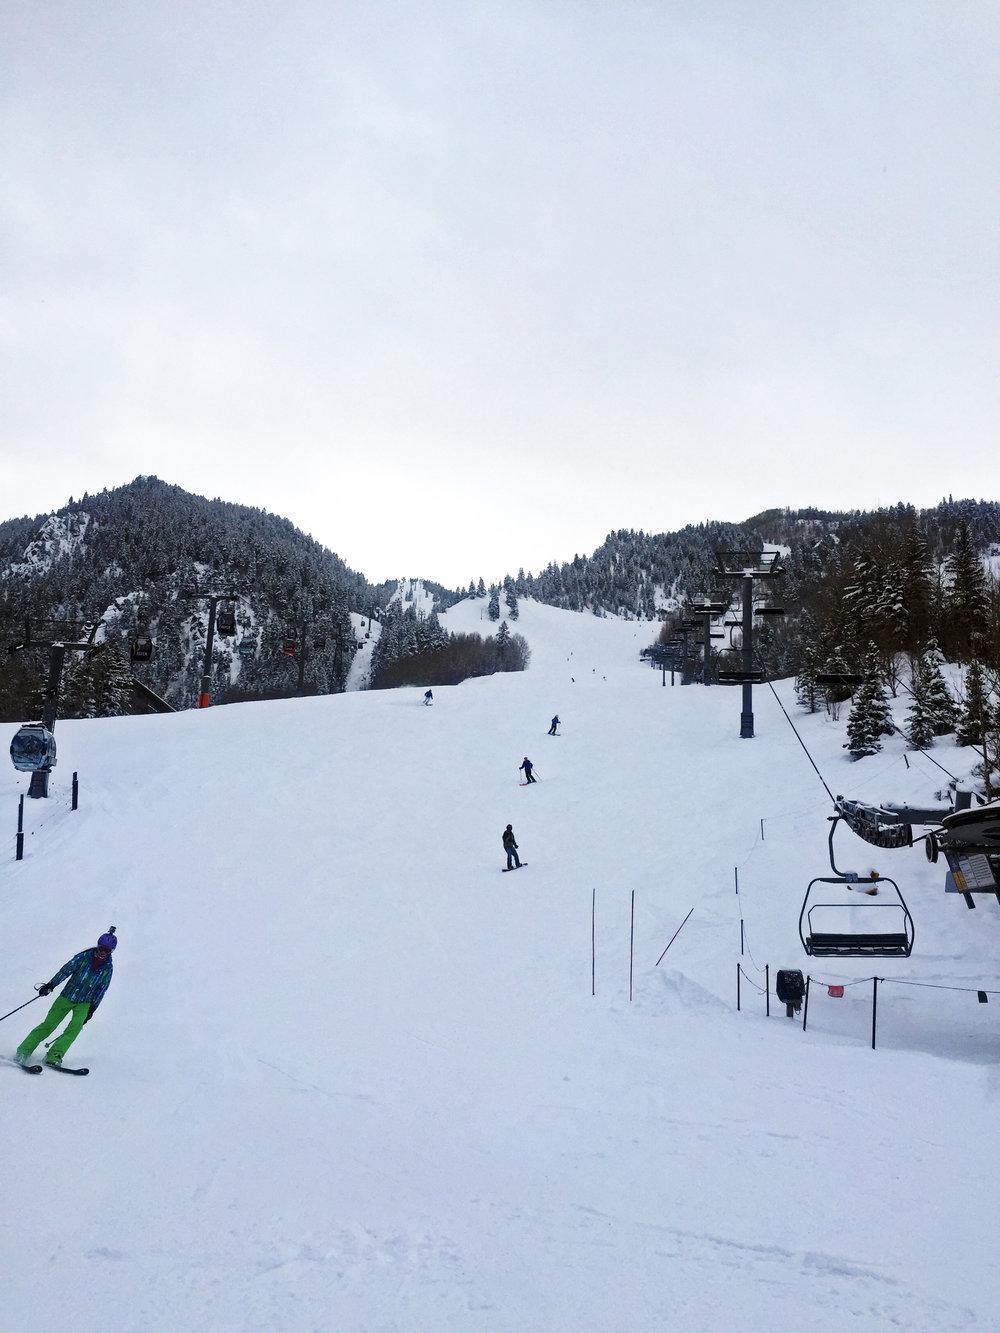 Buttermilk Mountain